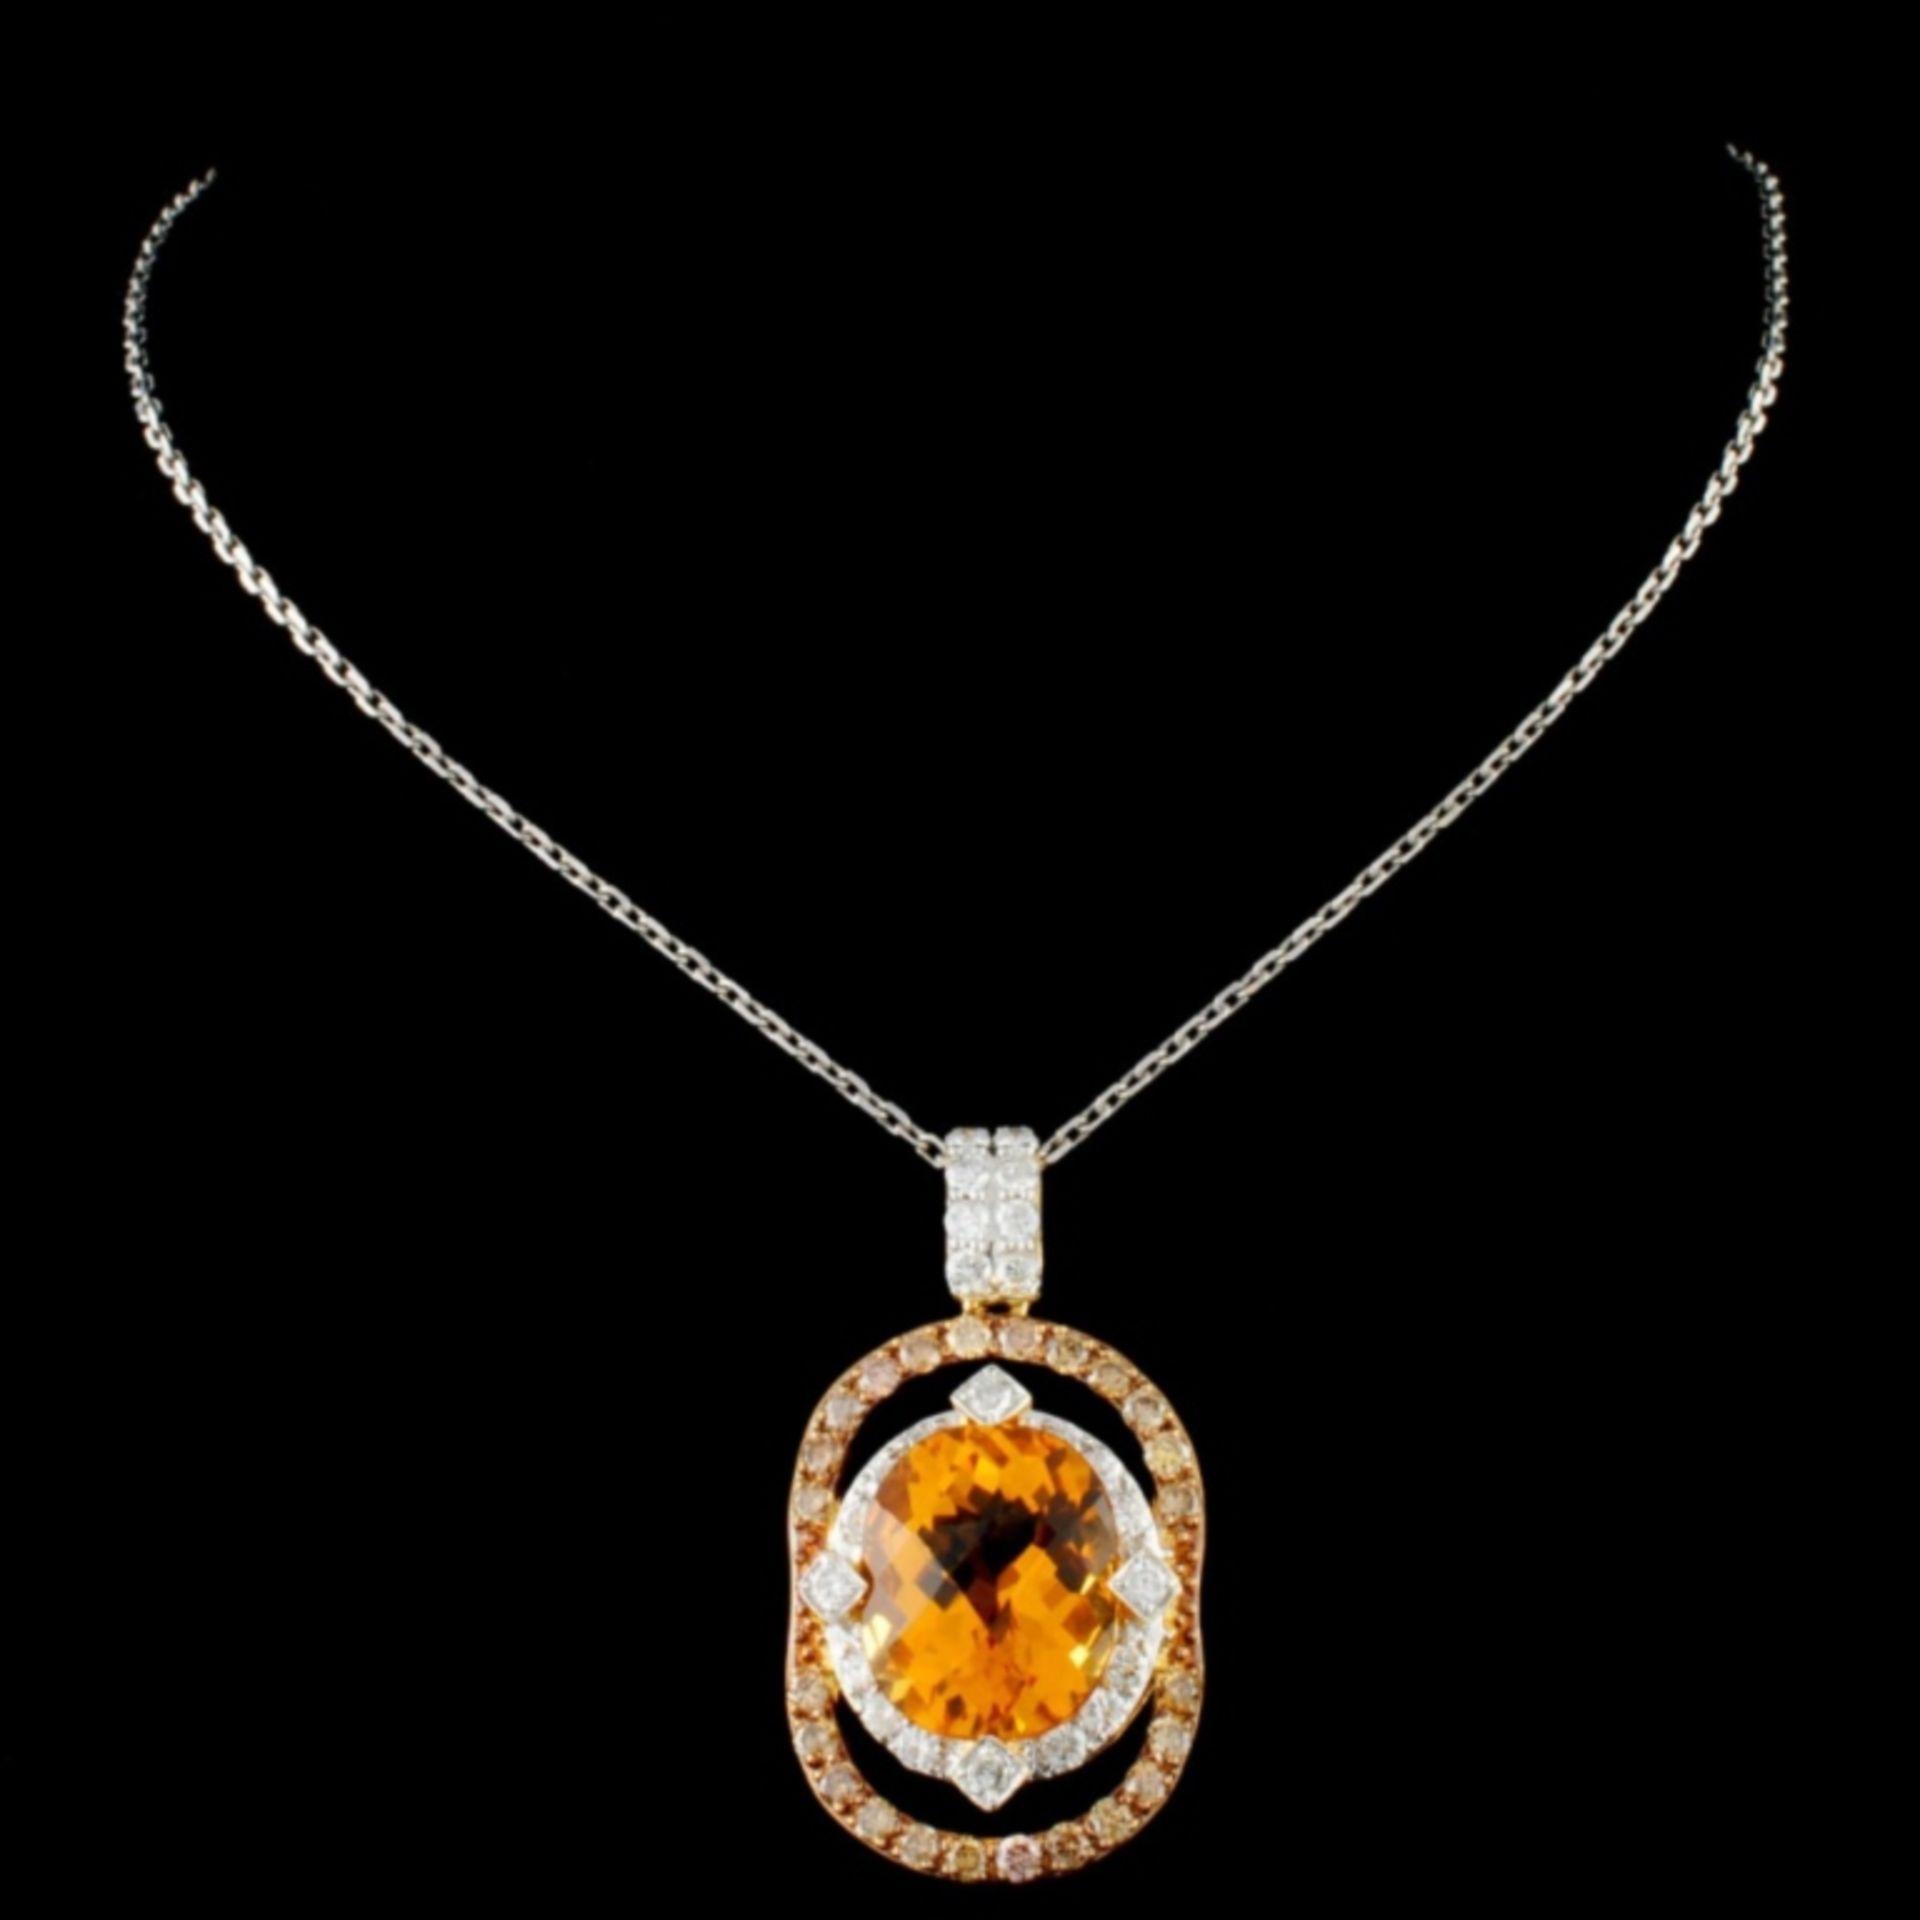 14K Gold 4.92ct Citrine & 1.05ctw Fancy Diamond Pe - Image 2 of 2